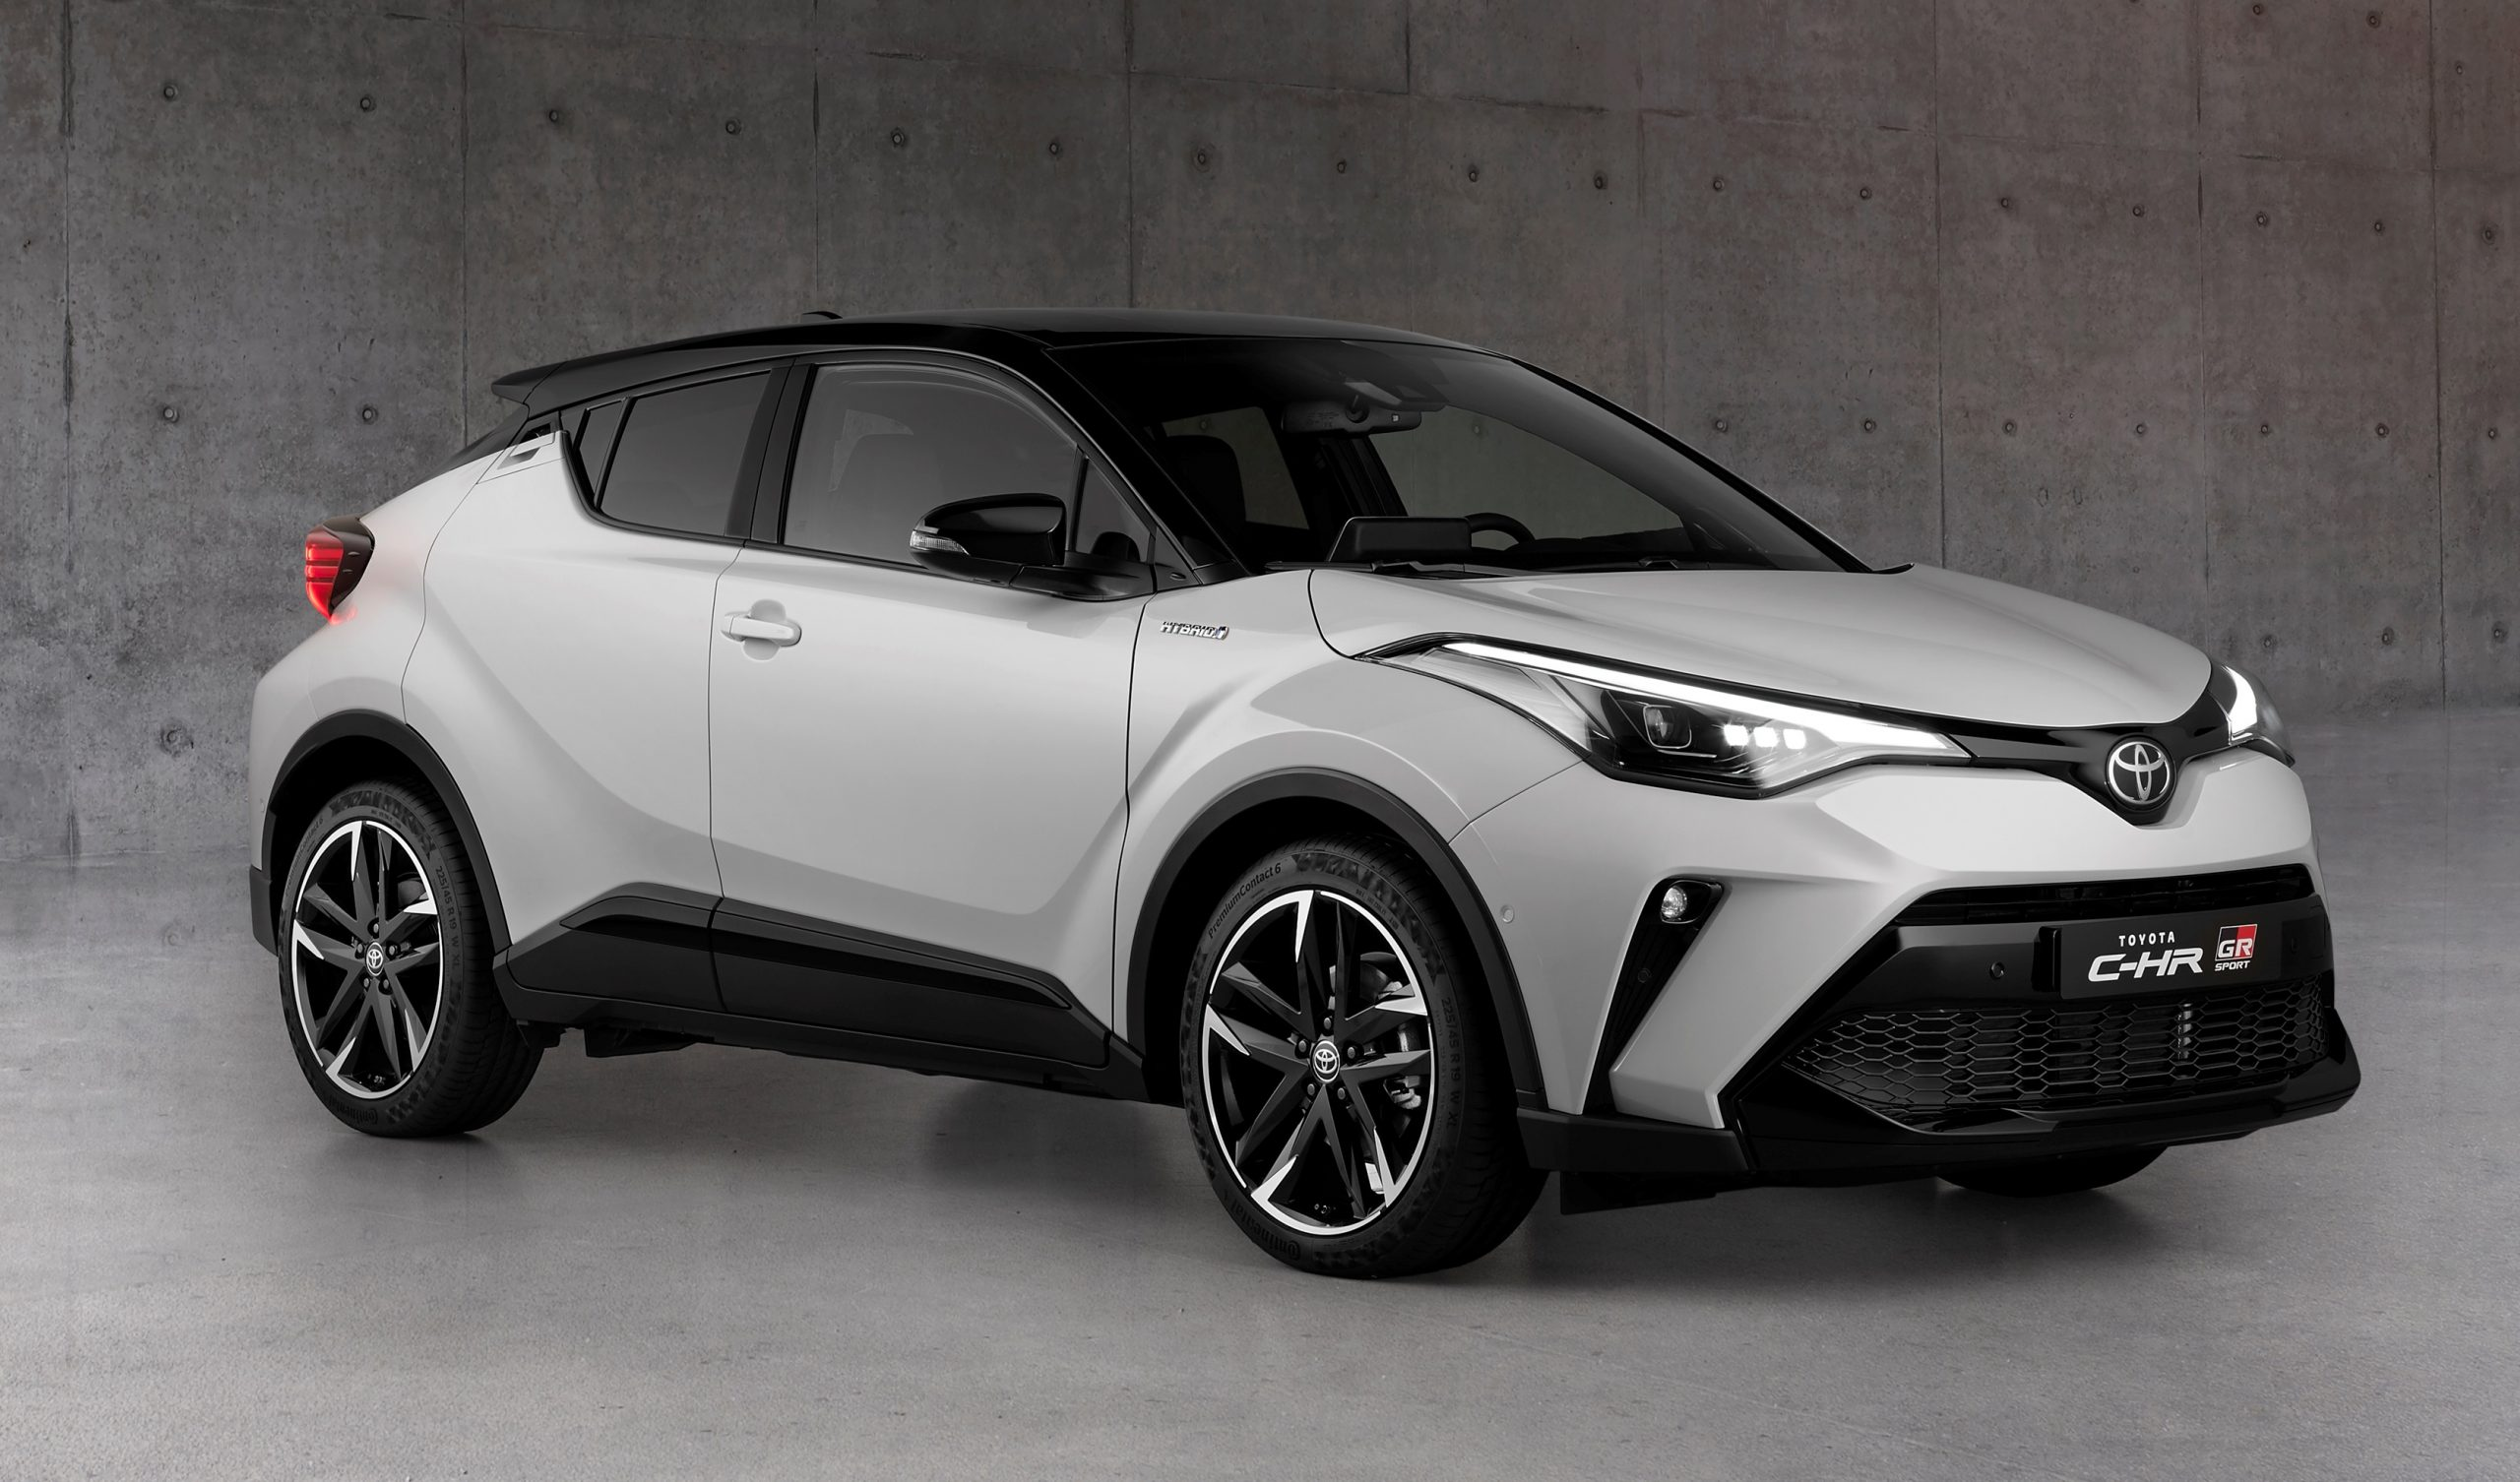 5 stelle per Honda Jazz e Mazda MX-30 - image chr23-scaled on https://motori.net